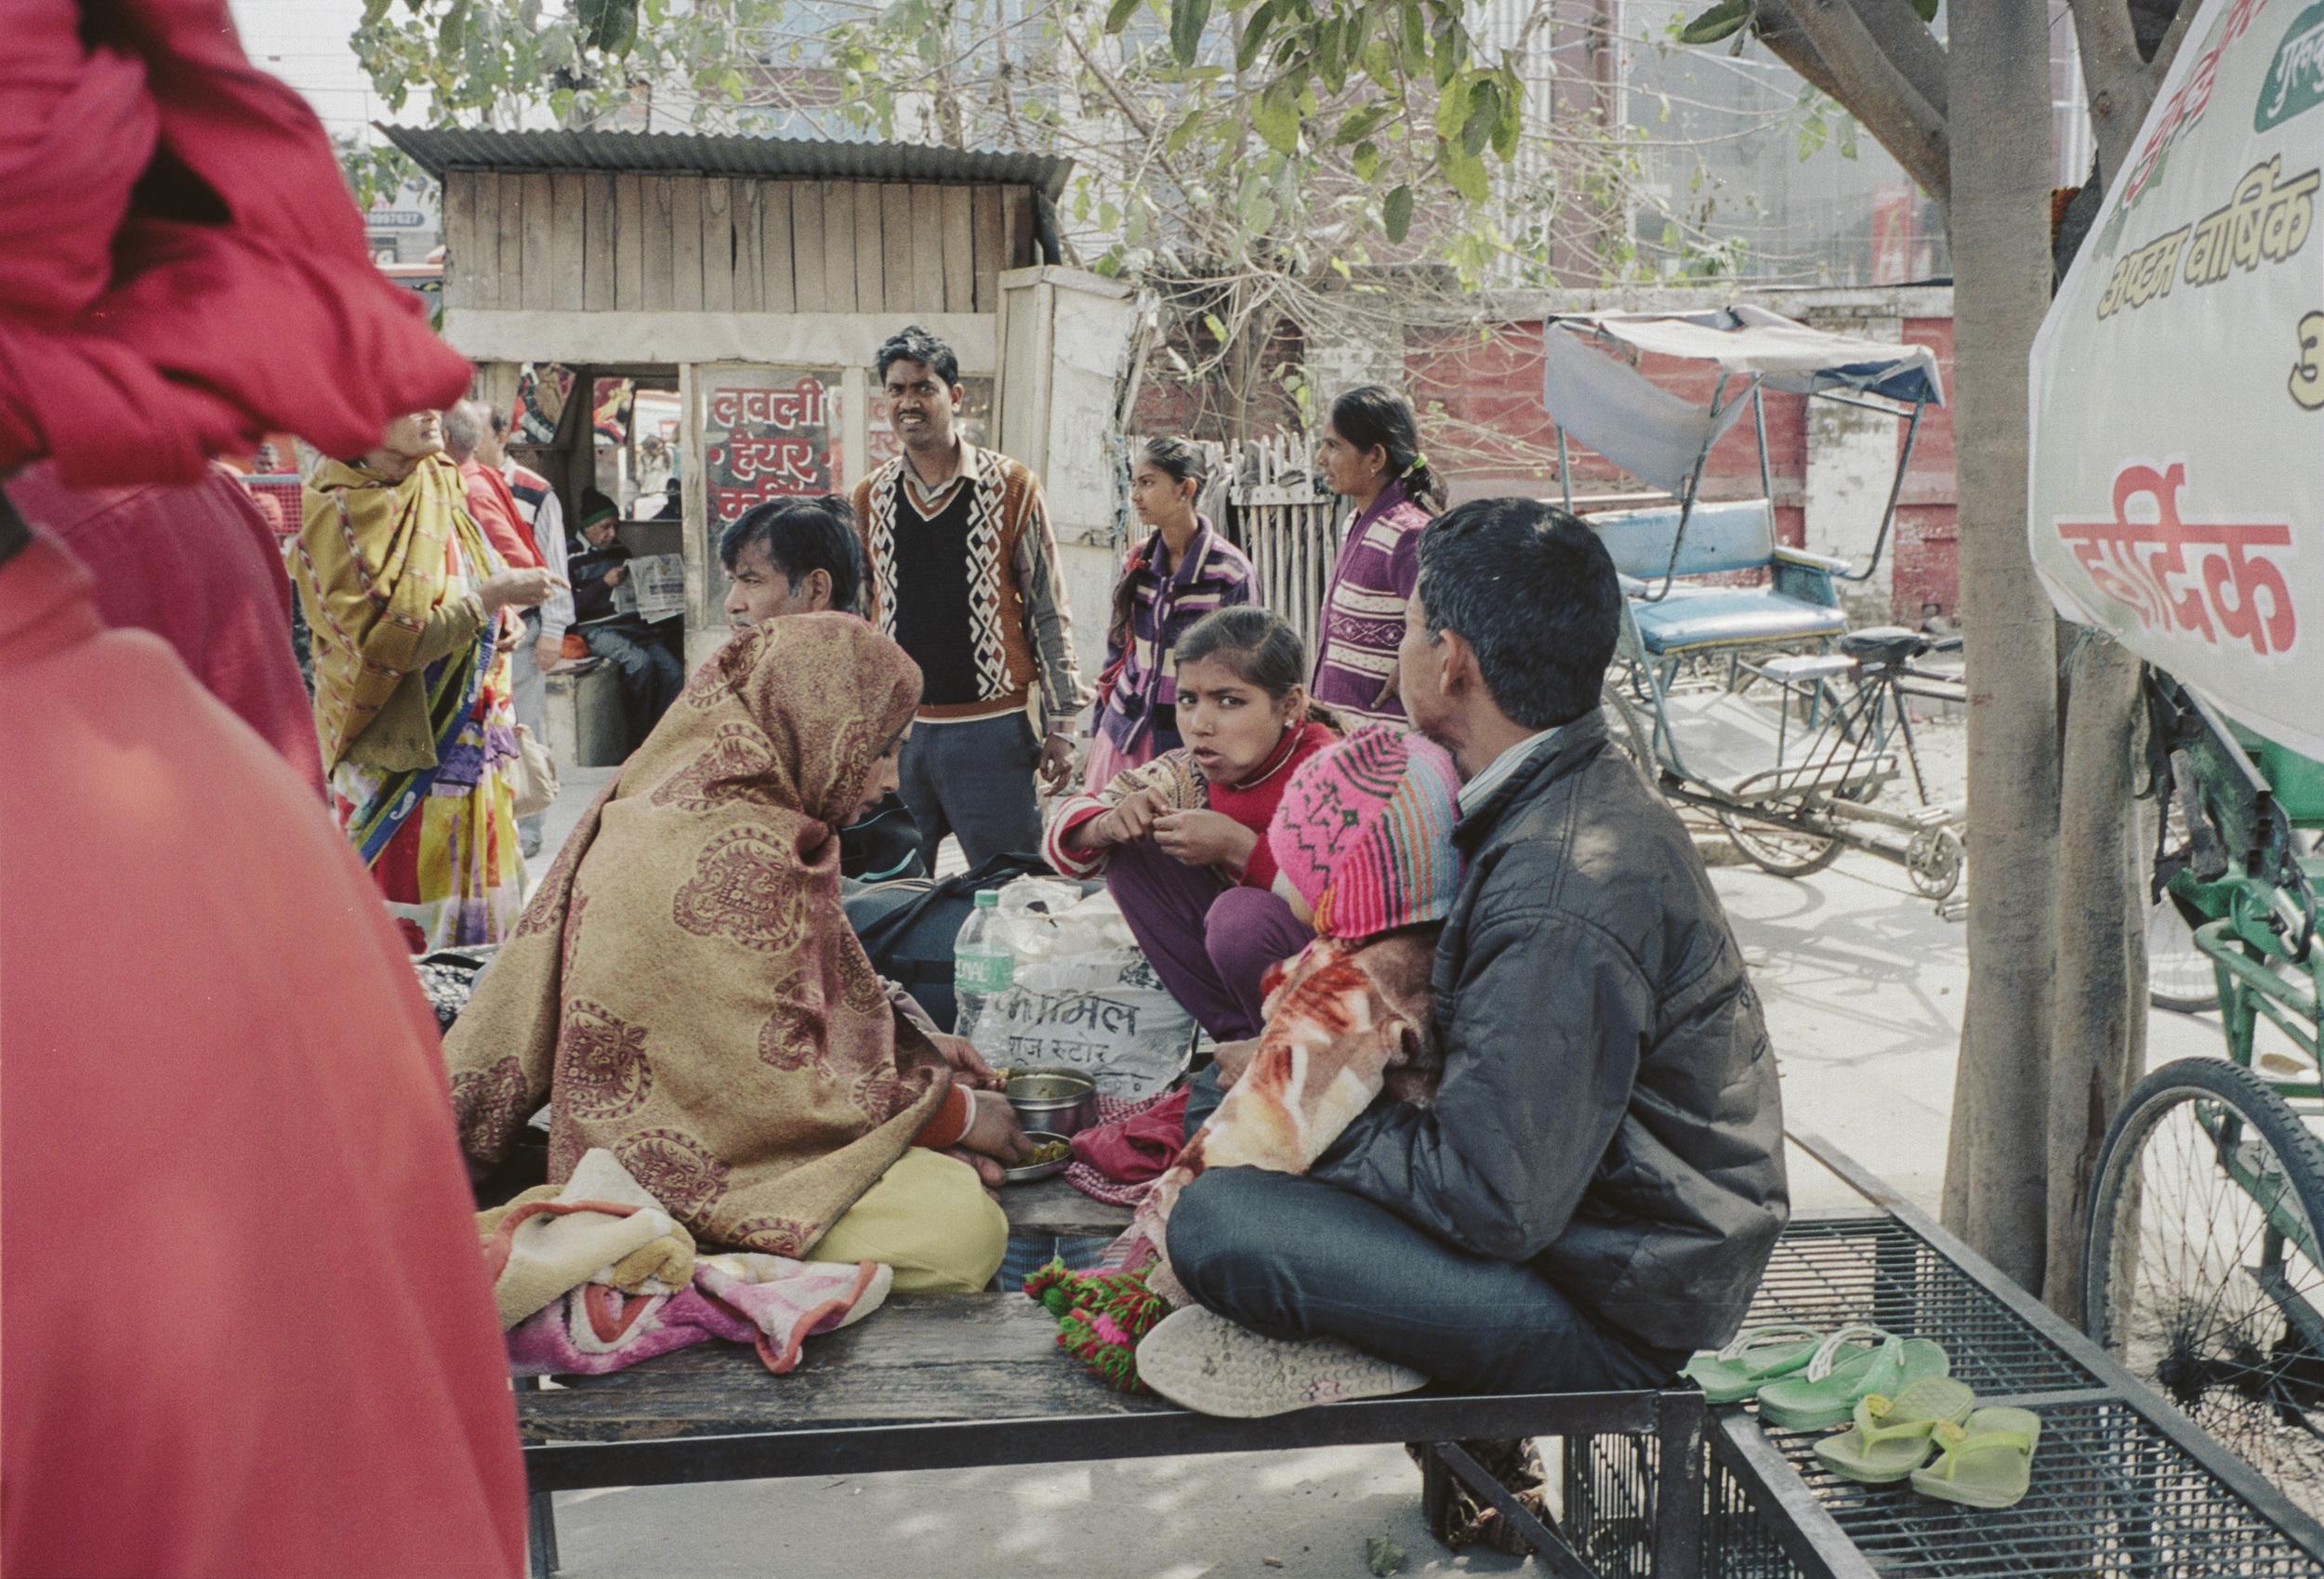 70-F36_Street, Family Eating, Haridwar, India 2016-43.jpg